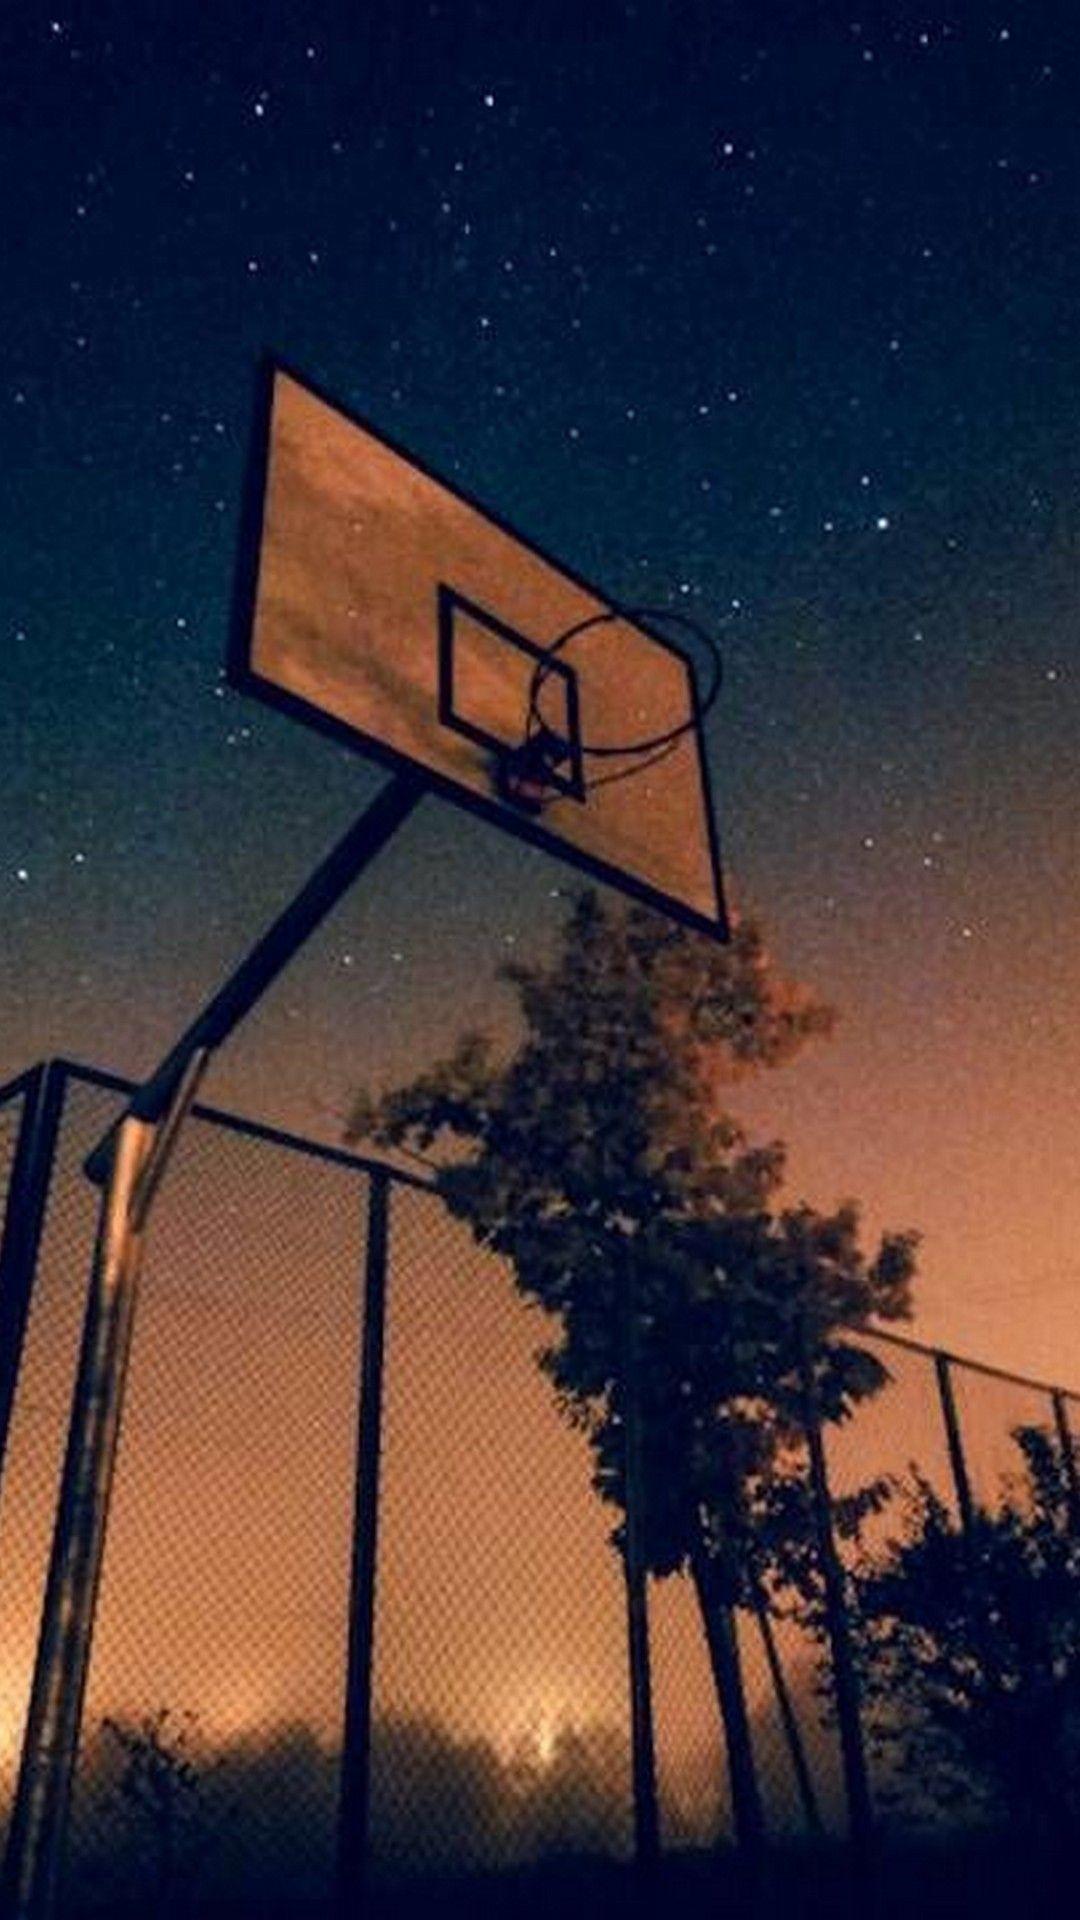 wallpaper basketball games iphone